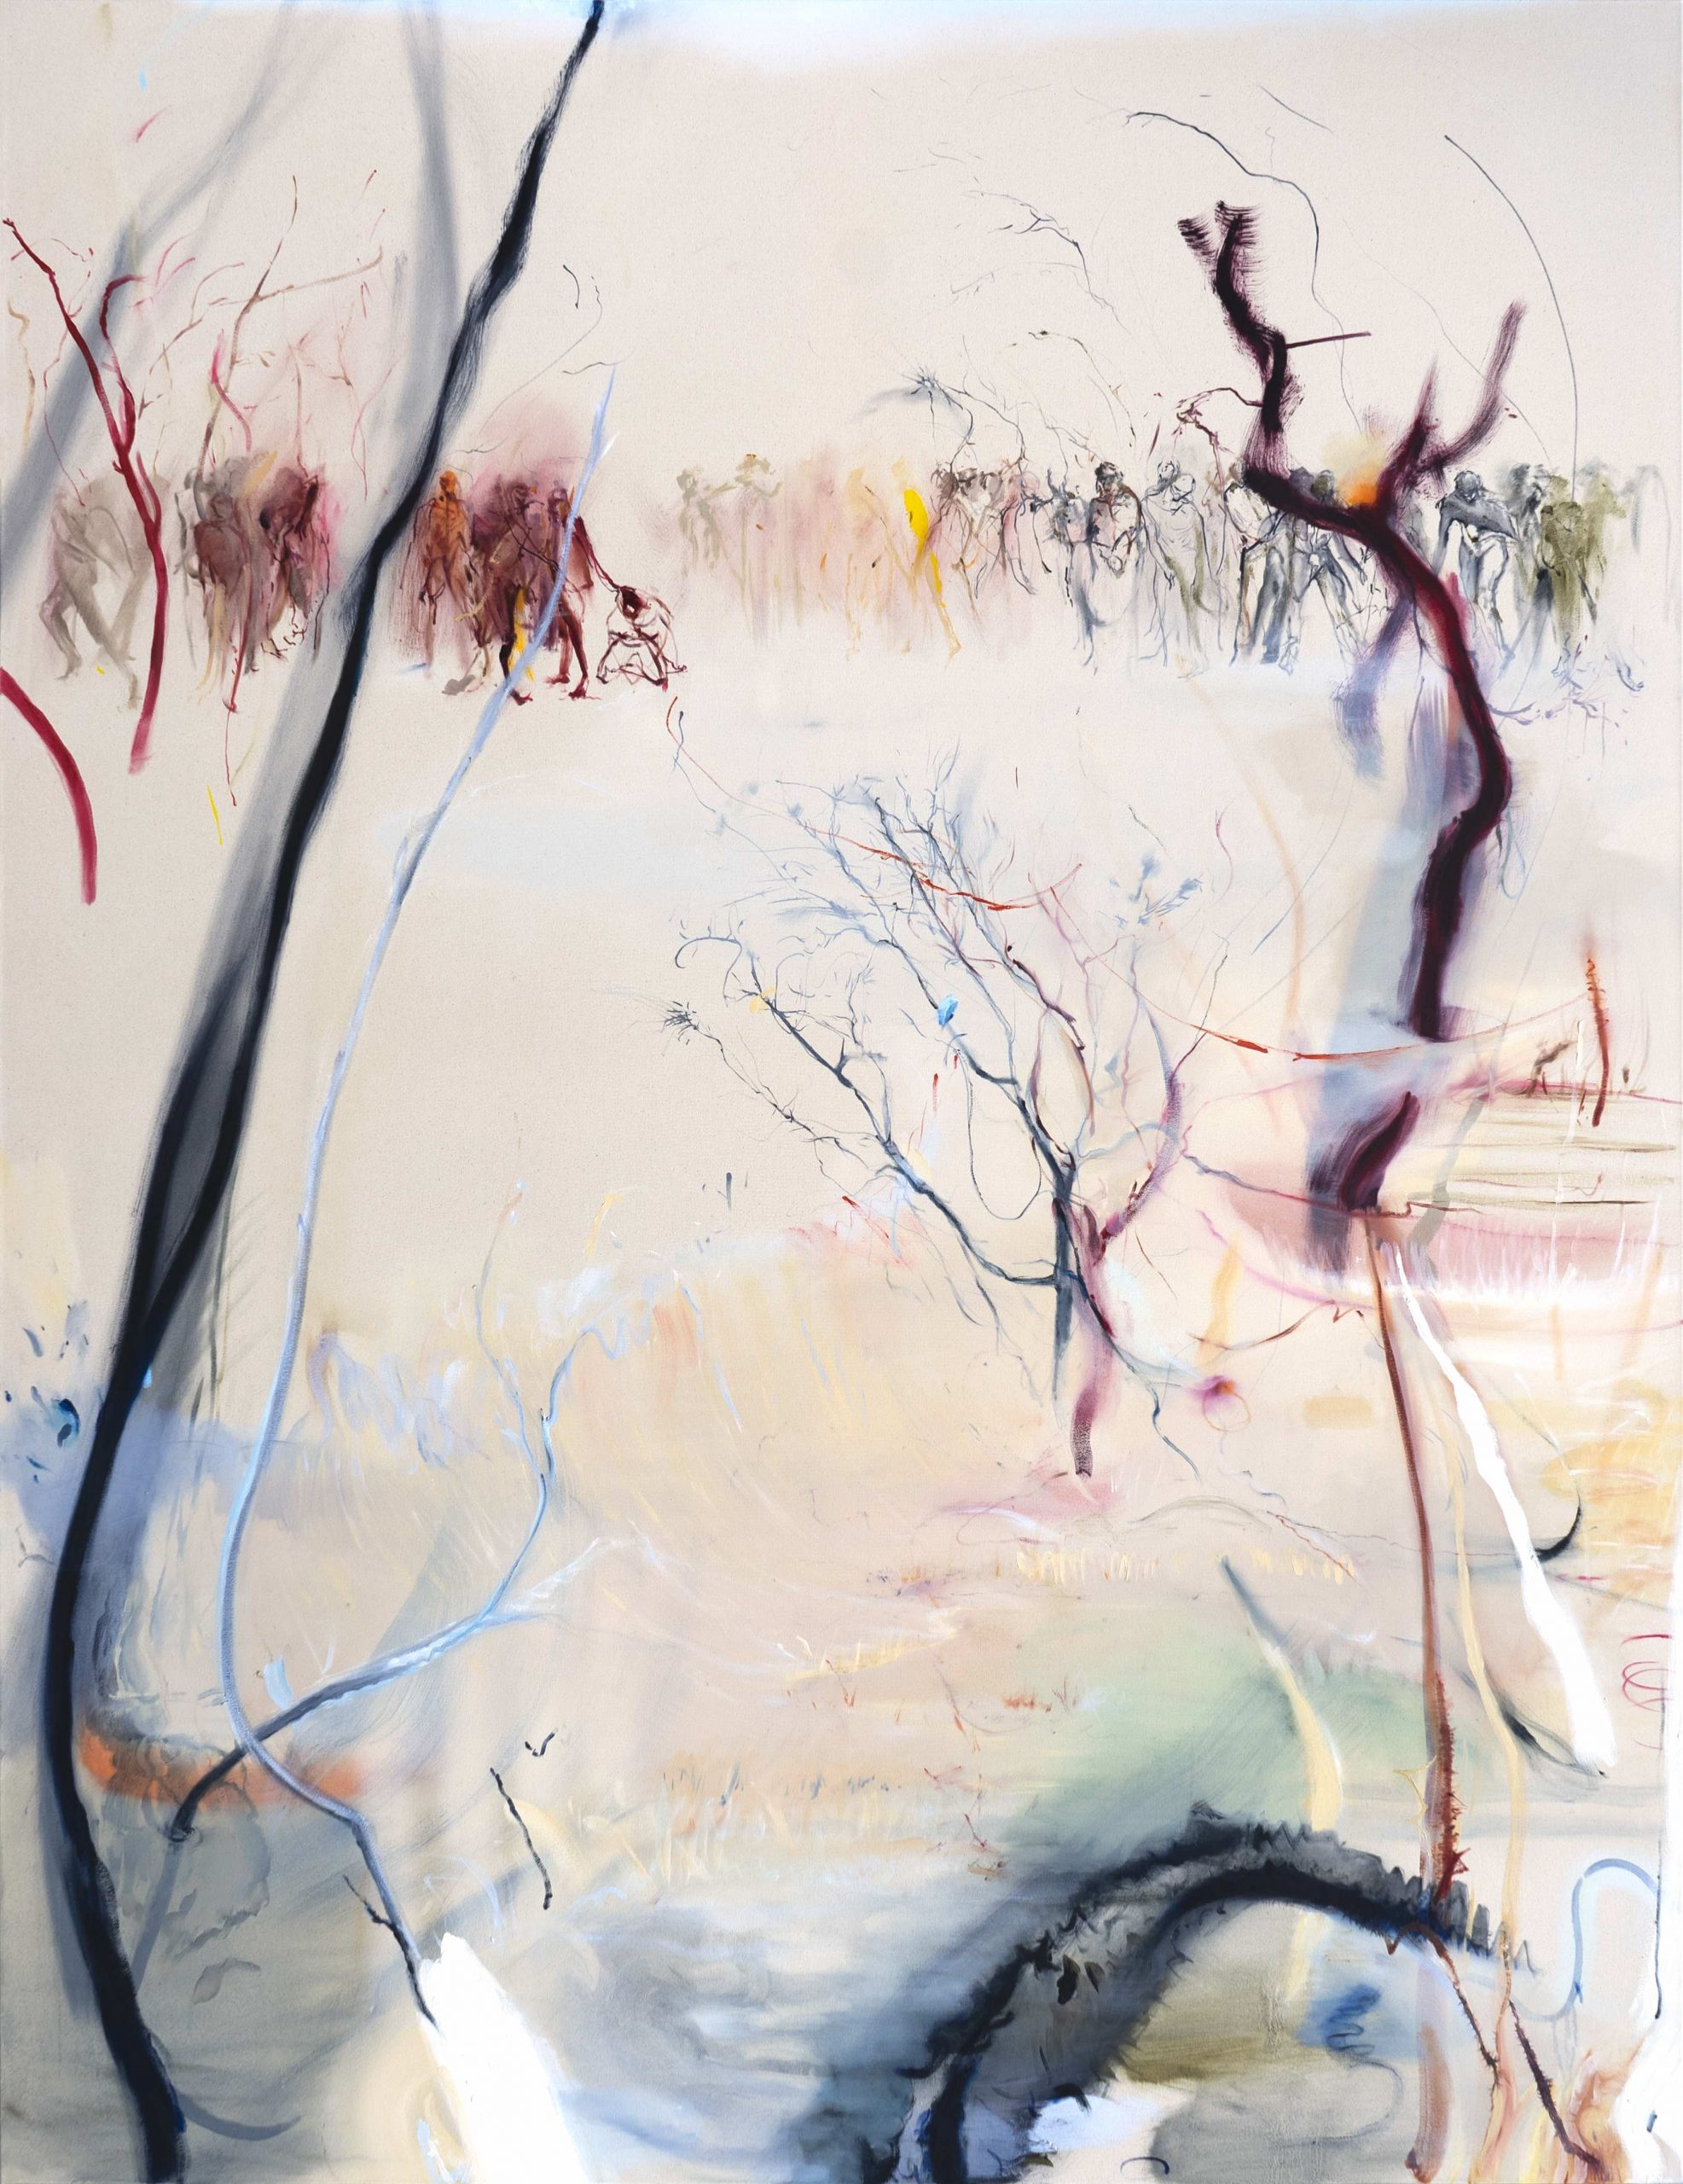 1mb Araminta Blue_The Block_200 x 160cm_oil on canvas_2020